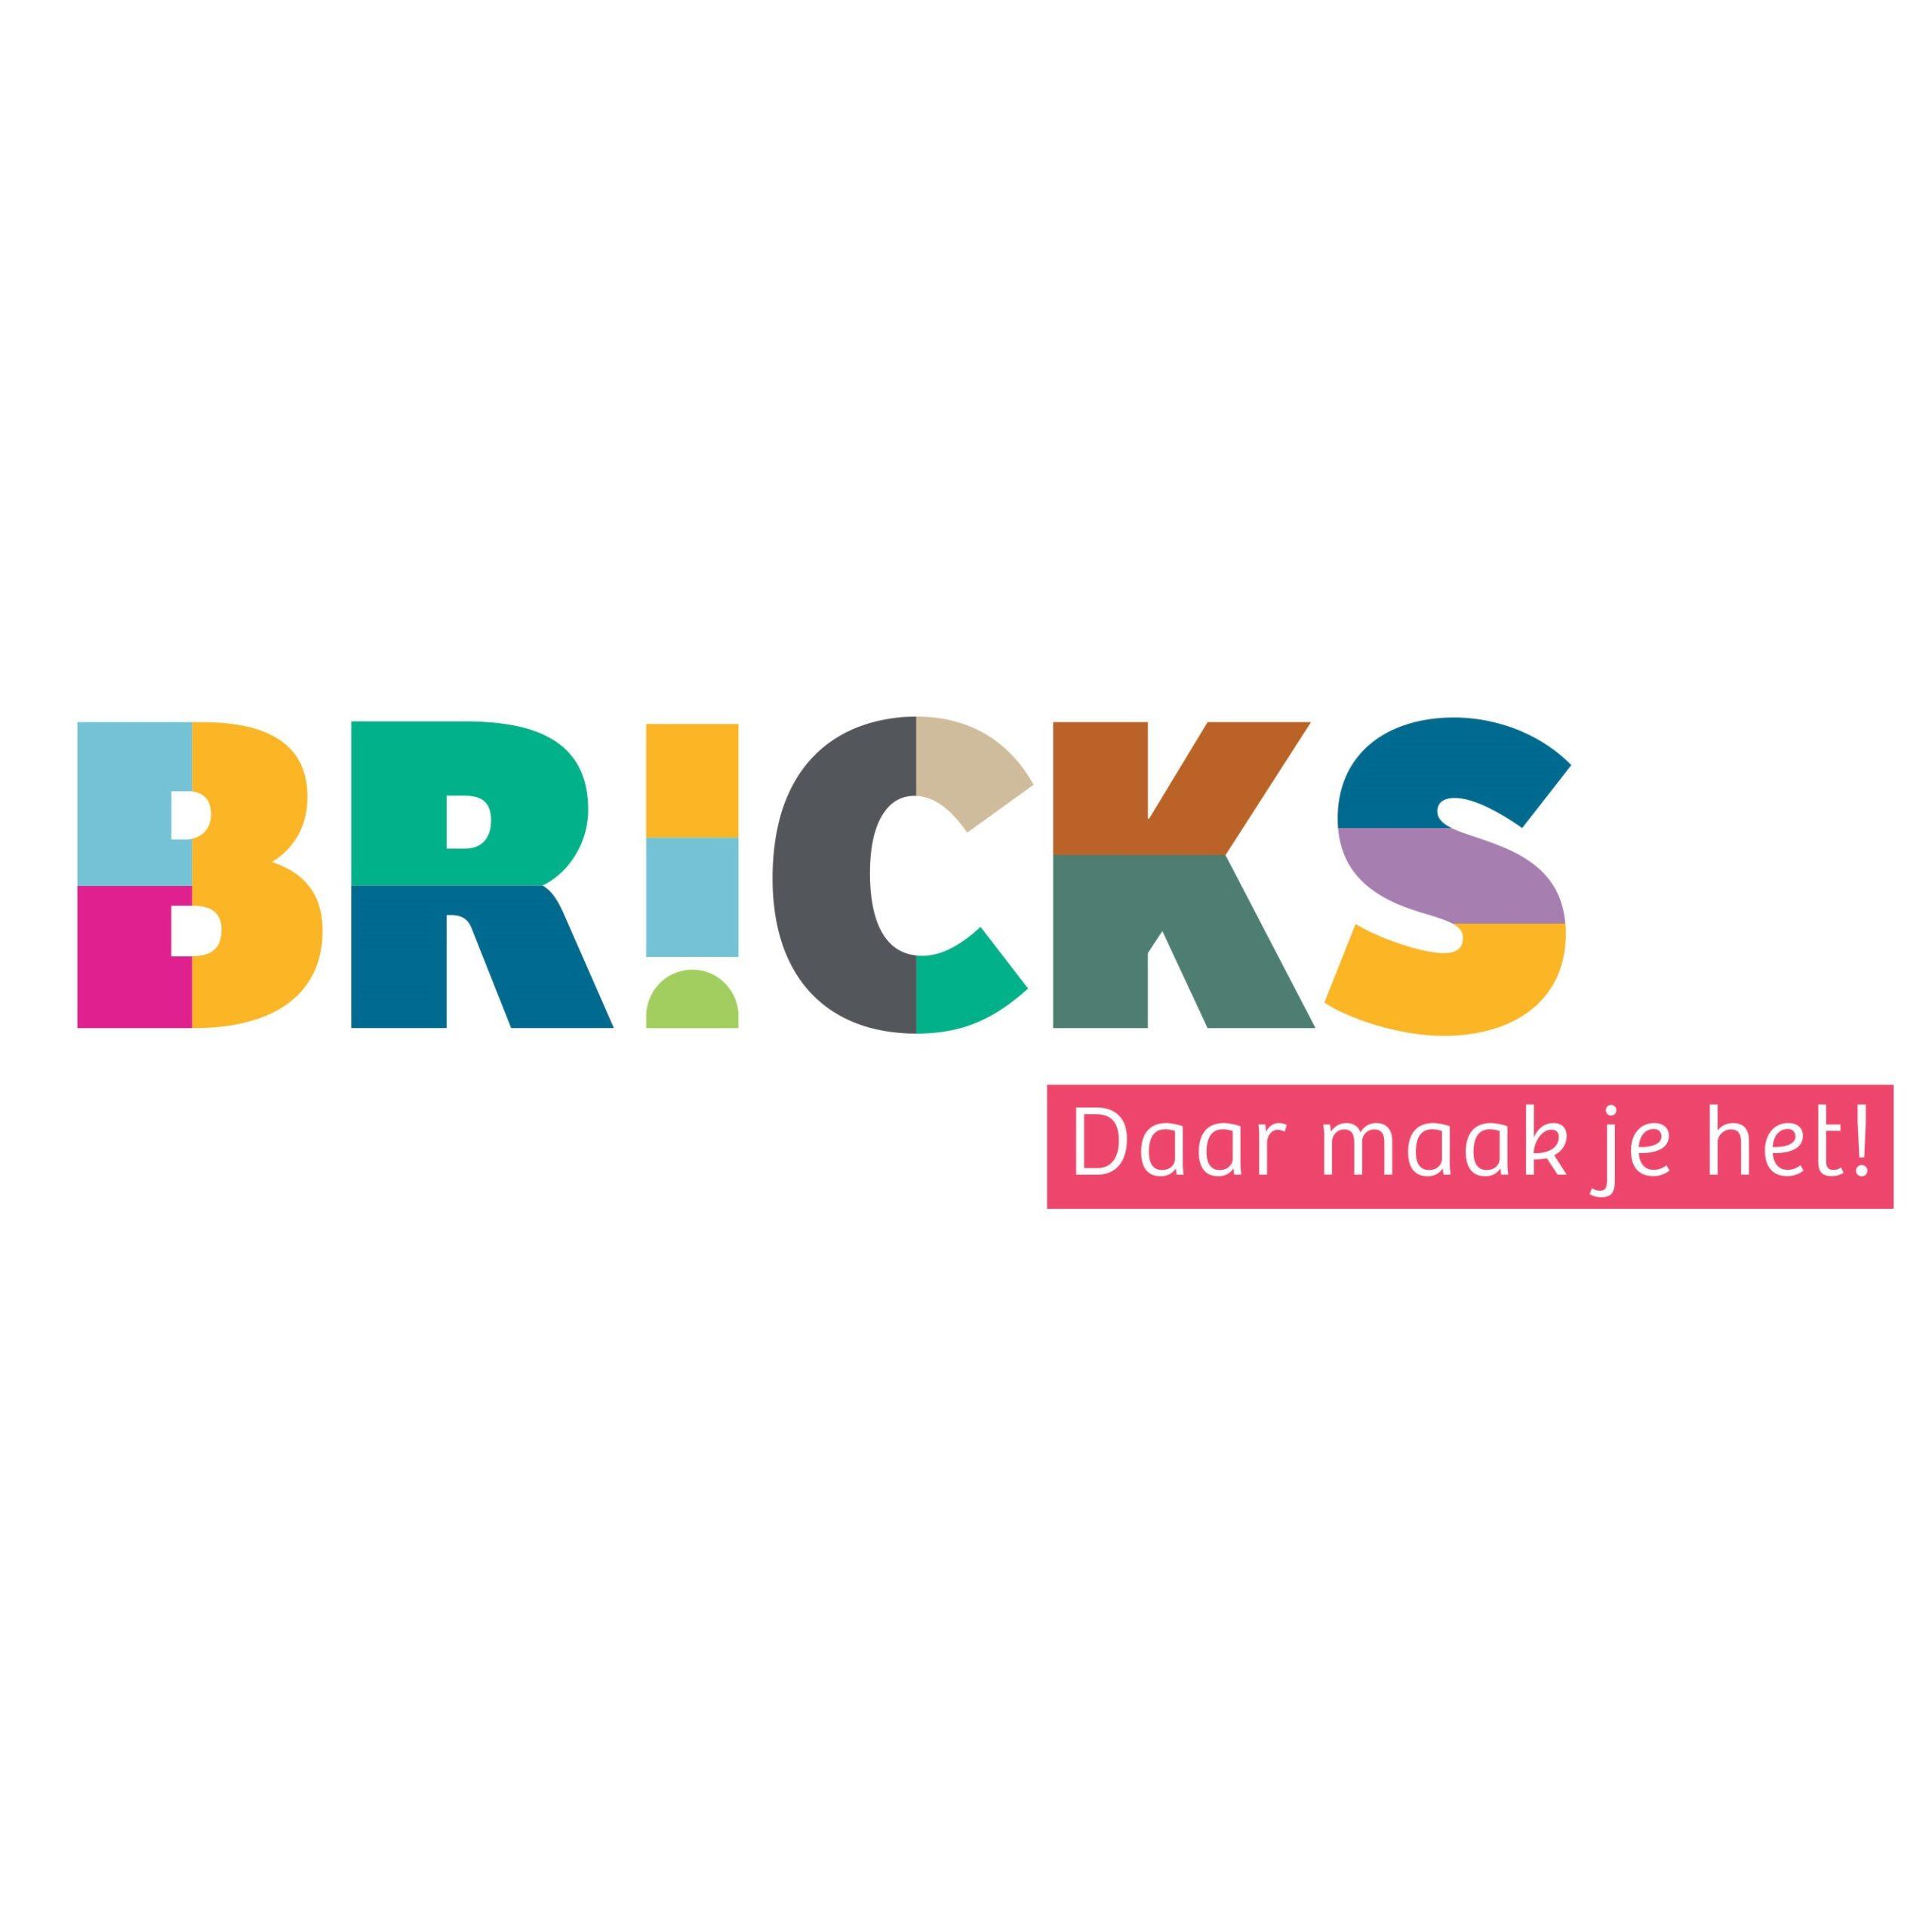 BR!CKS